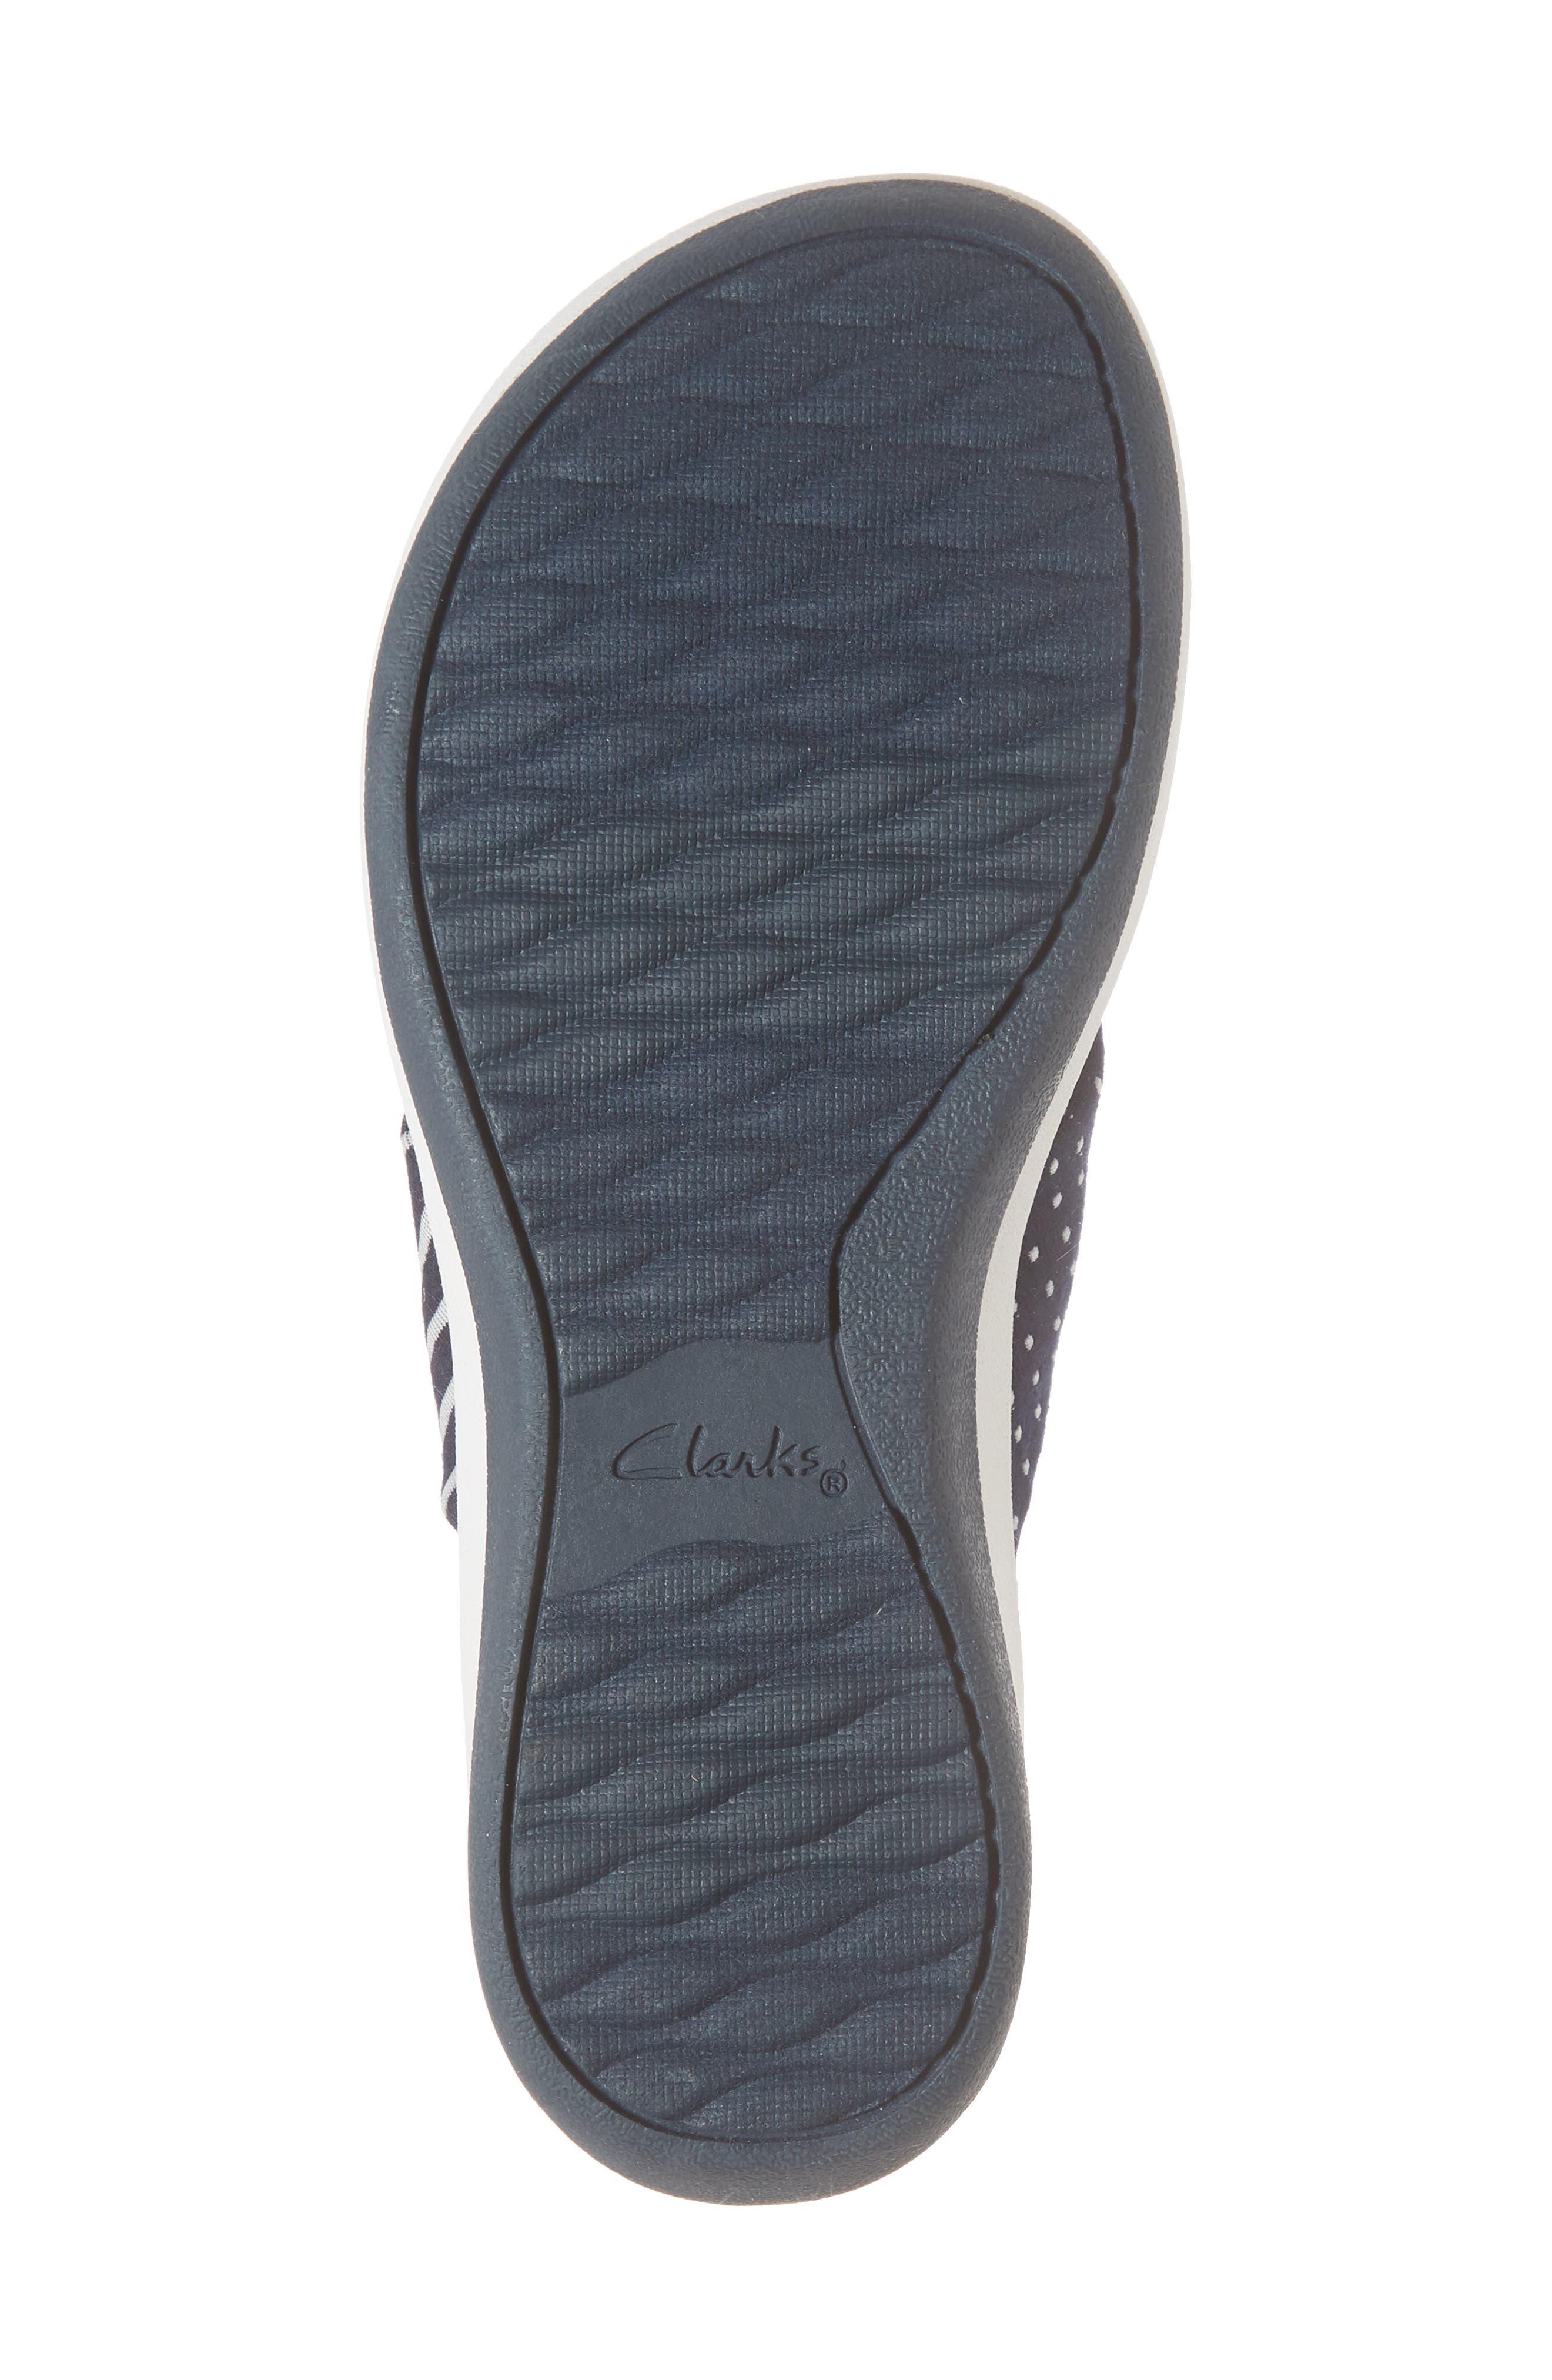 Arla Glison Flip Flop,                             Alternate thumbnail 6, color,                             Navy Fabric